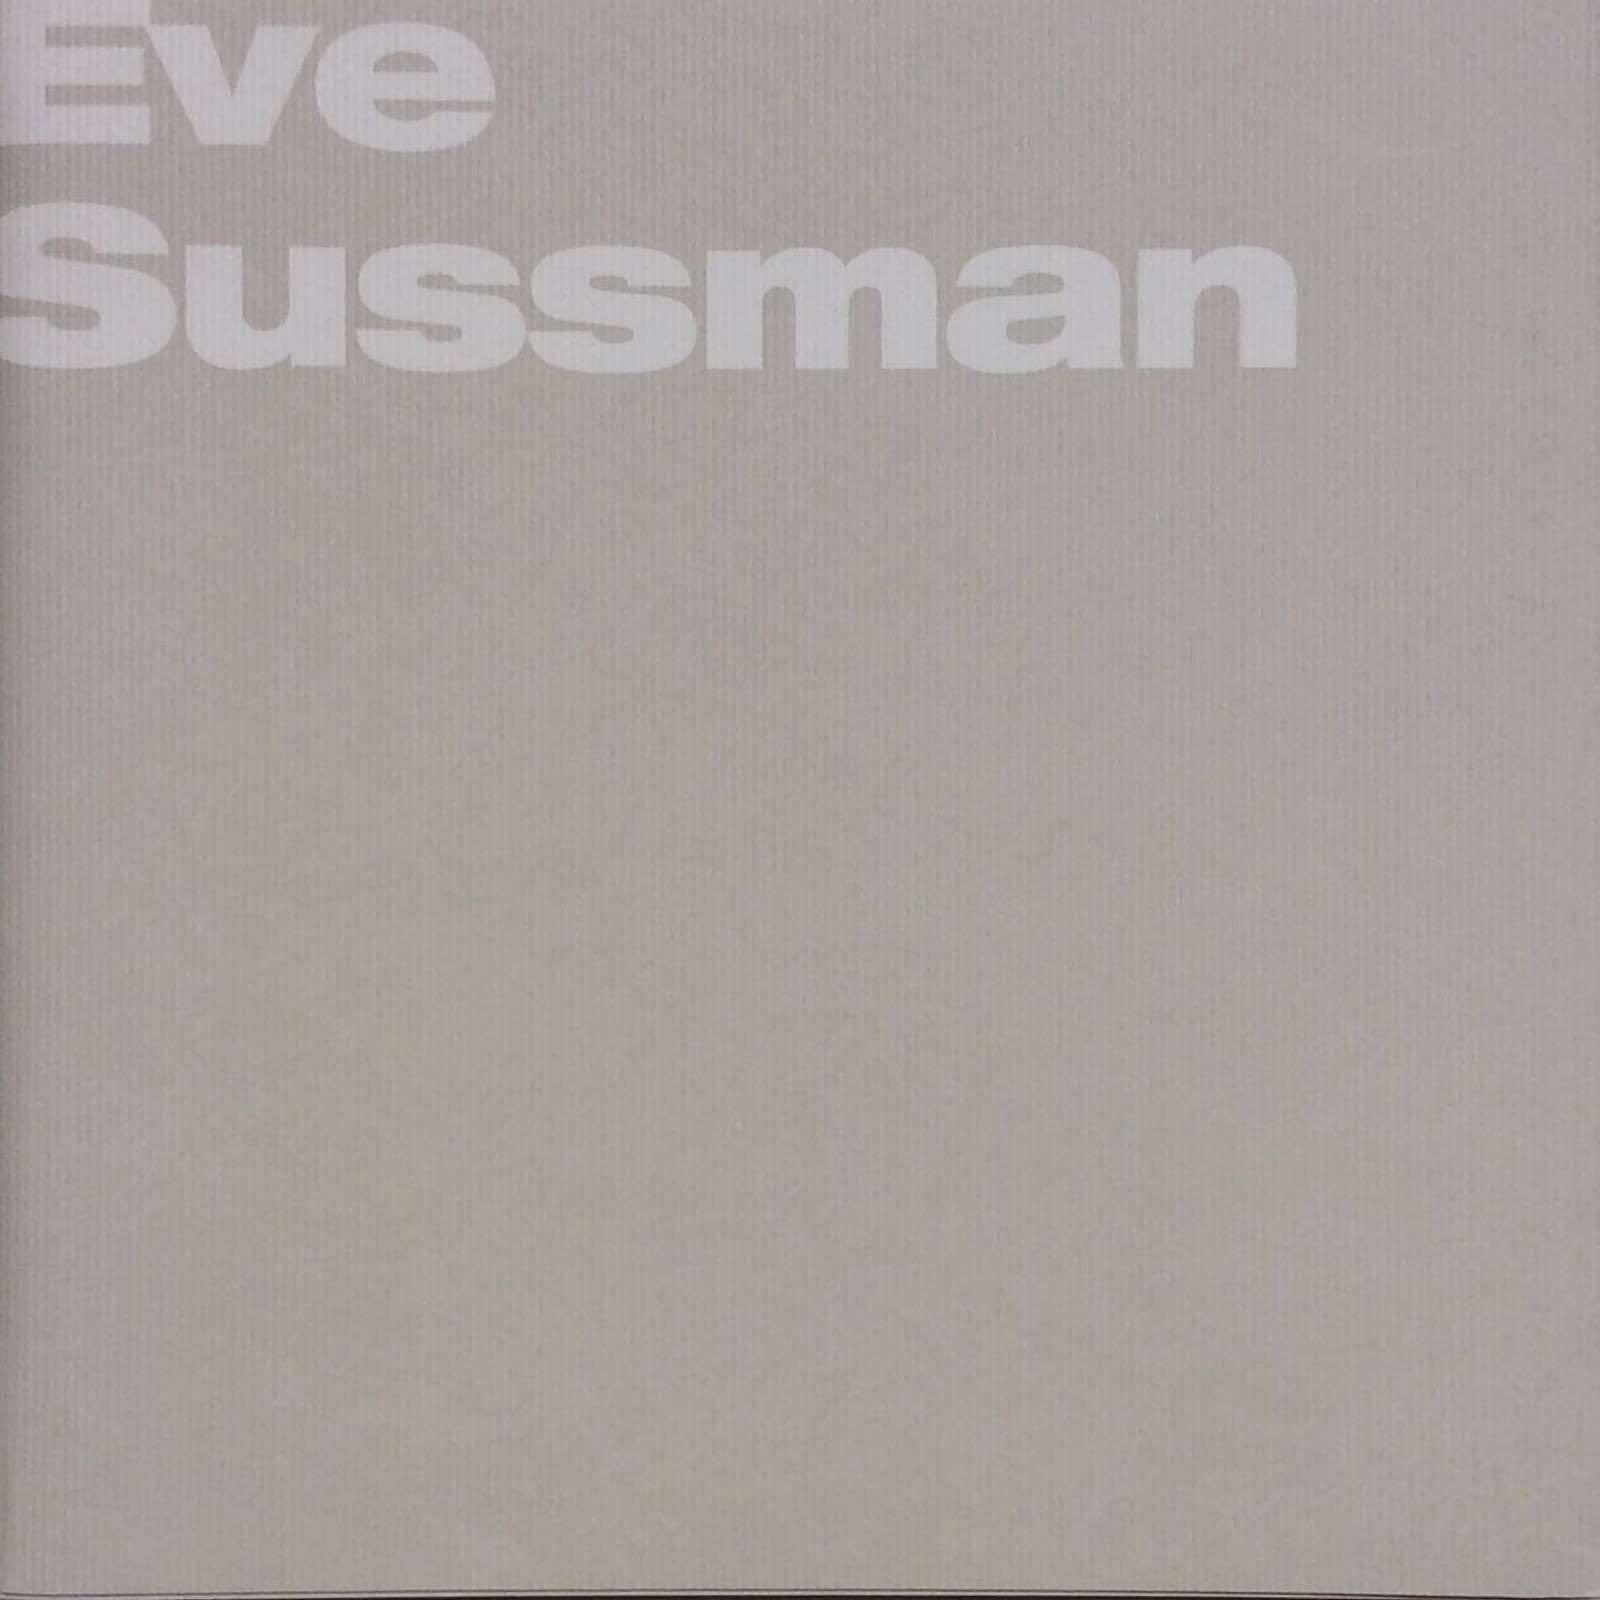 Bjerregaard, Galleri Bo. Eve Sussman